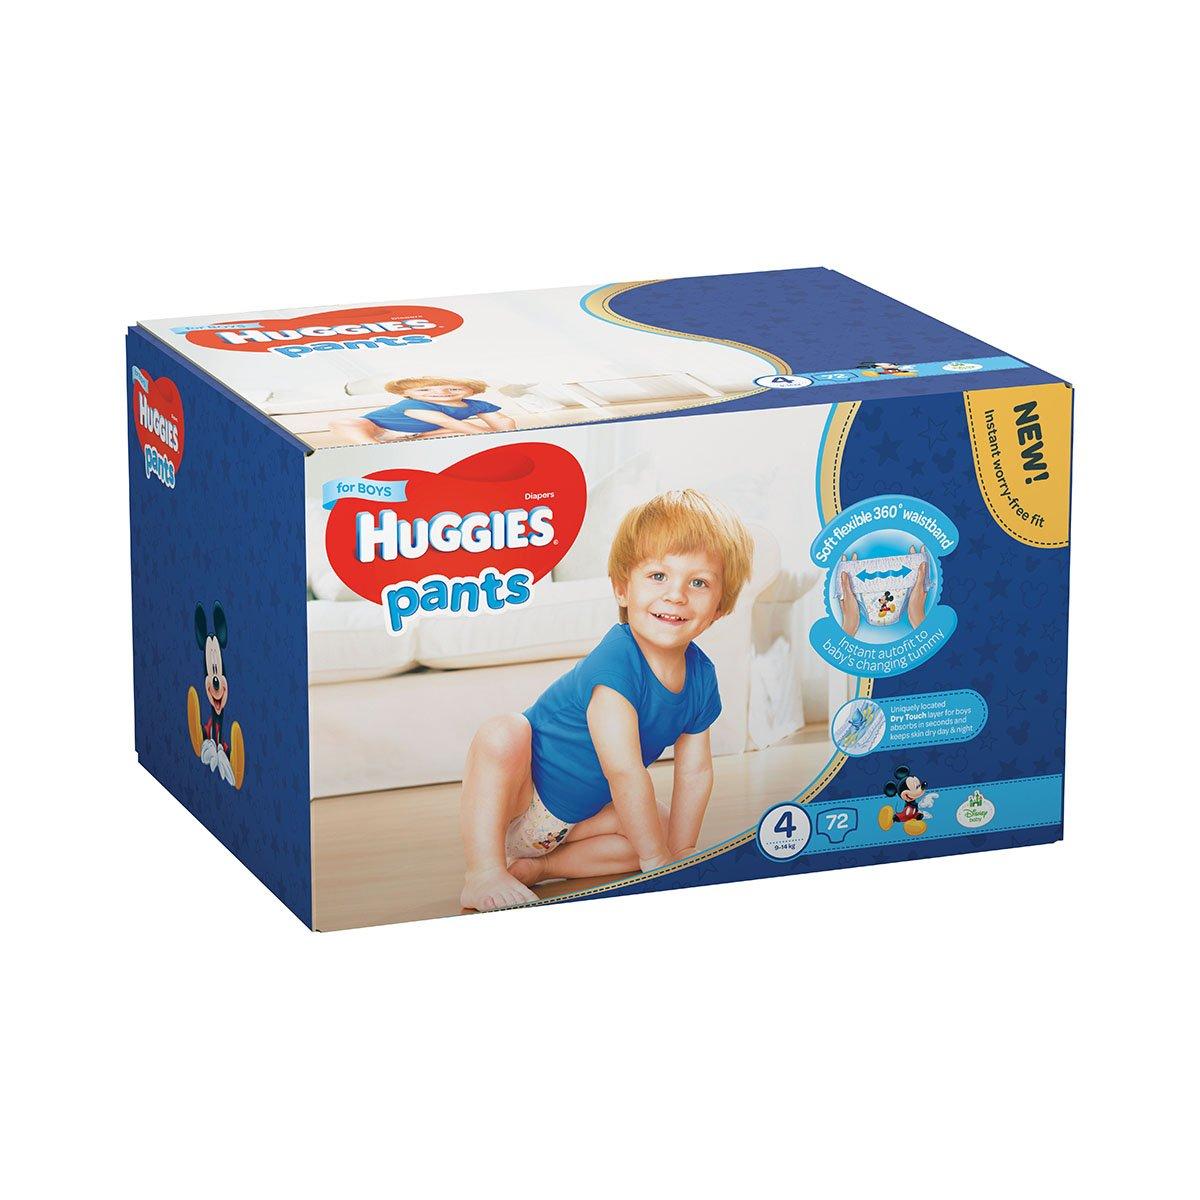 Scutece Huggies Pants Box Boys, Nr 4, 9 - 14 Kg, 72 buc imagine